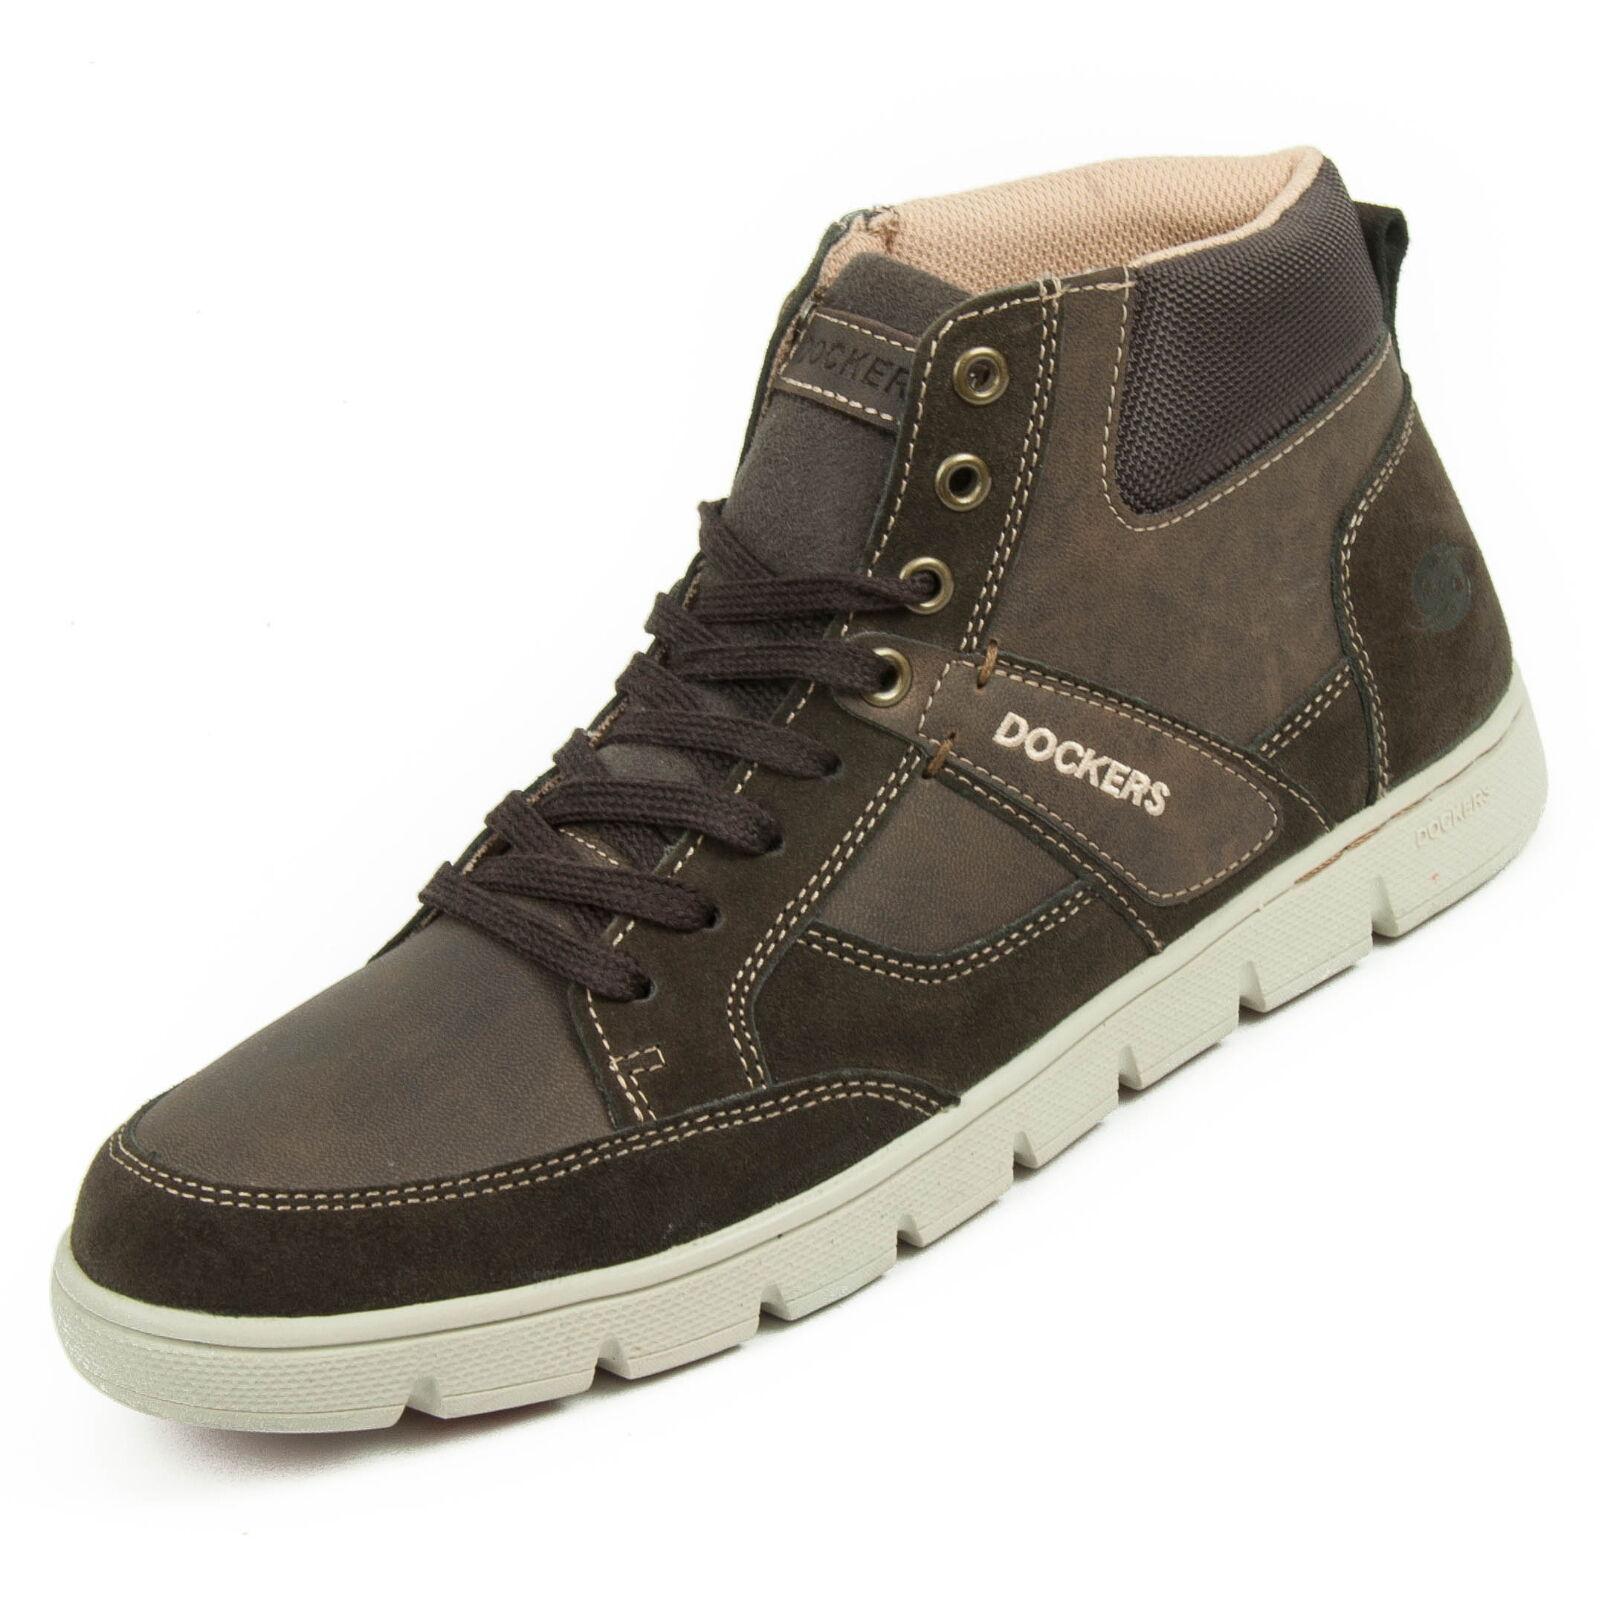 DOCKERS Zapatos Hombre Altura 43 deportiva de piel talla 43 Altura Café 35bj008-204320 4cbbc8